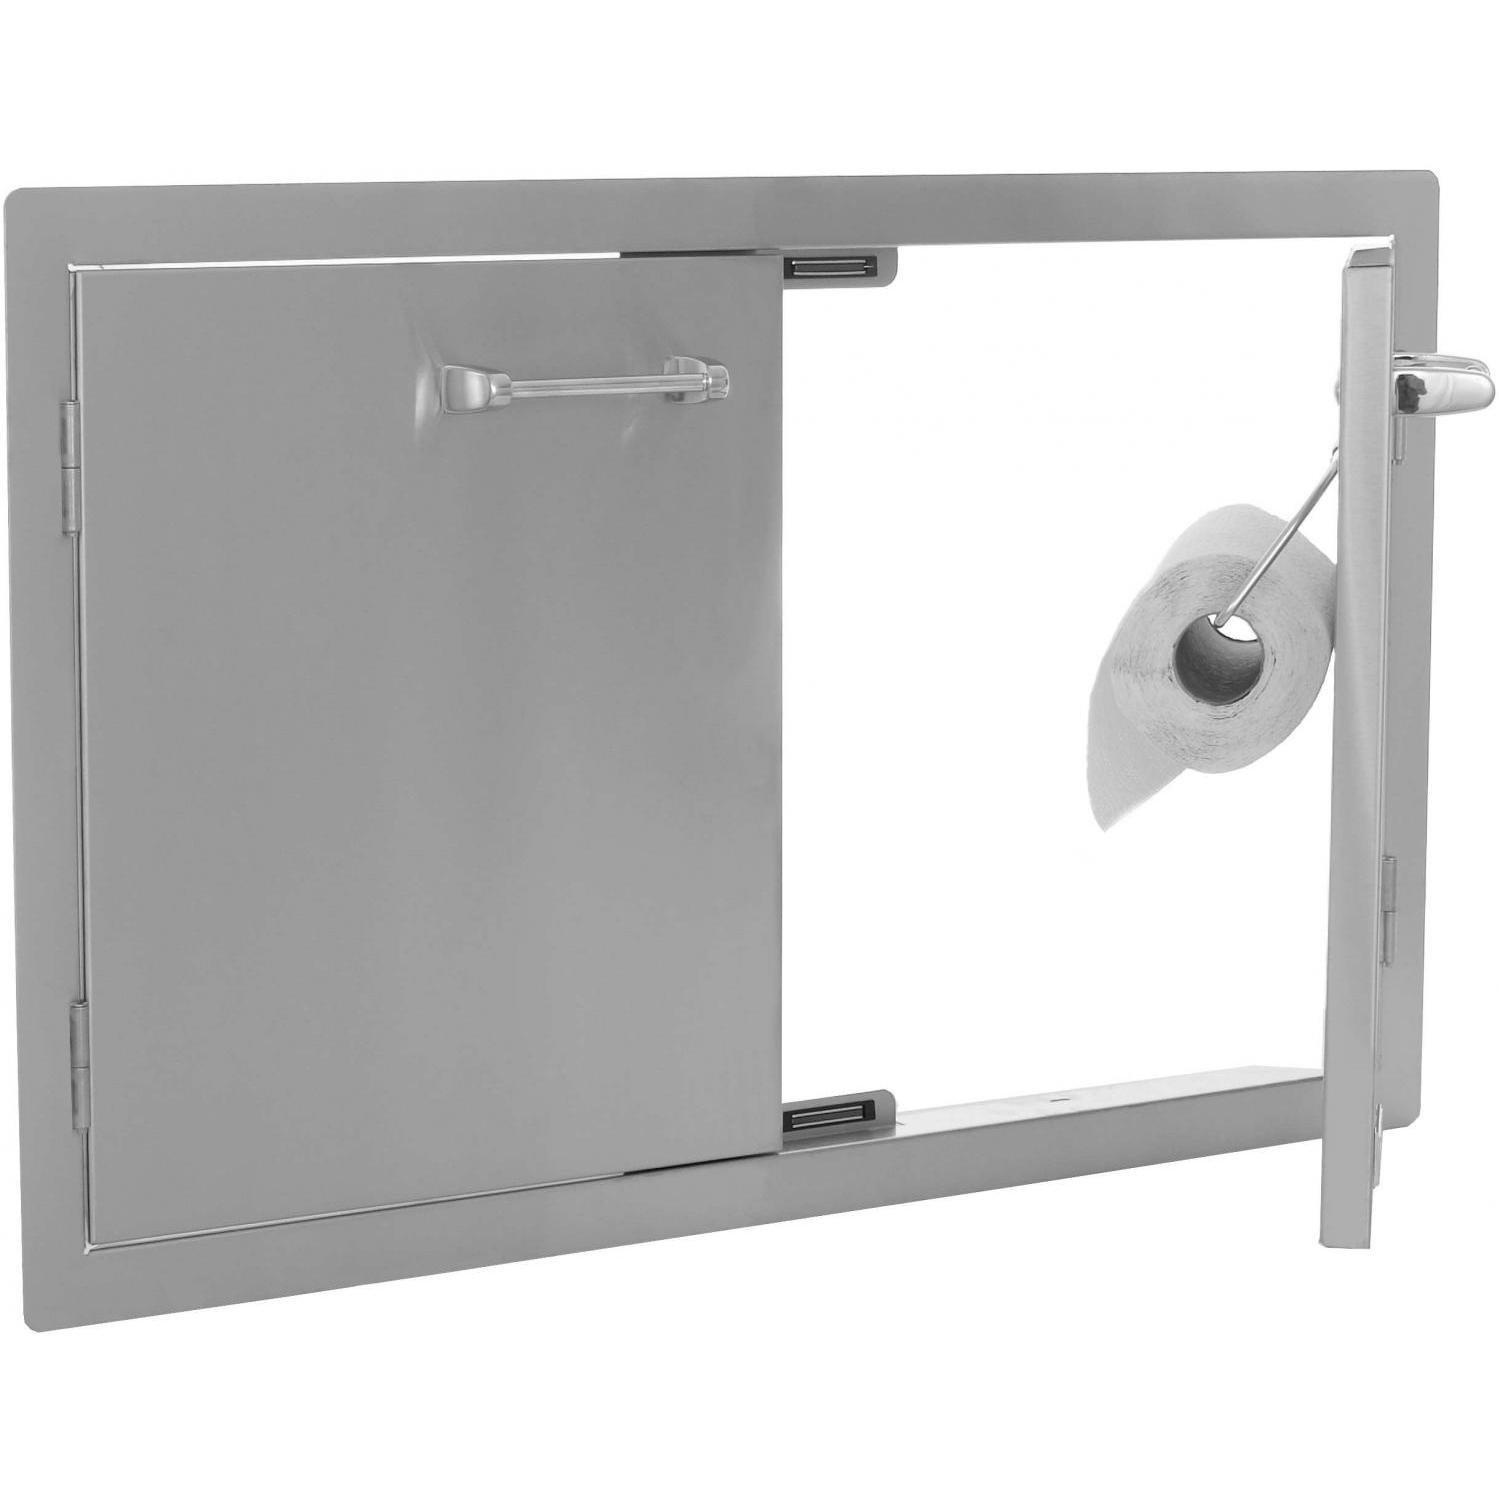 Amazon.com : Lion Premium Grills L3322 Double Door 33\